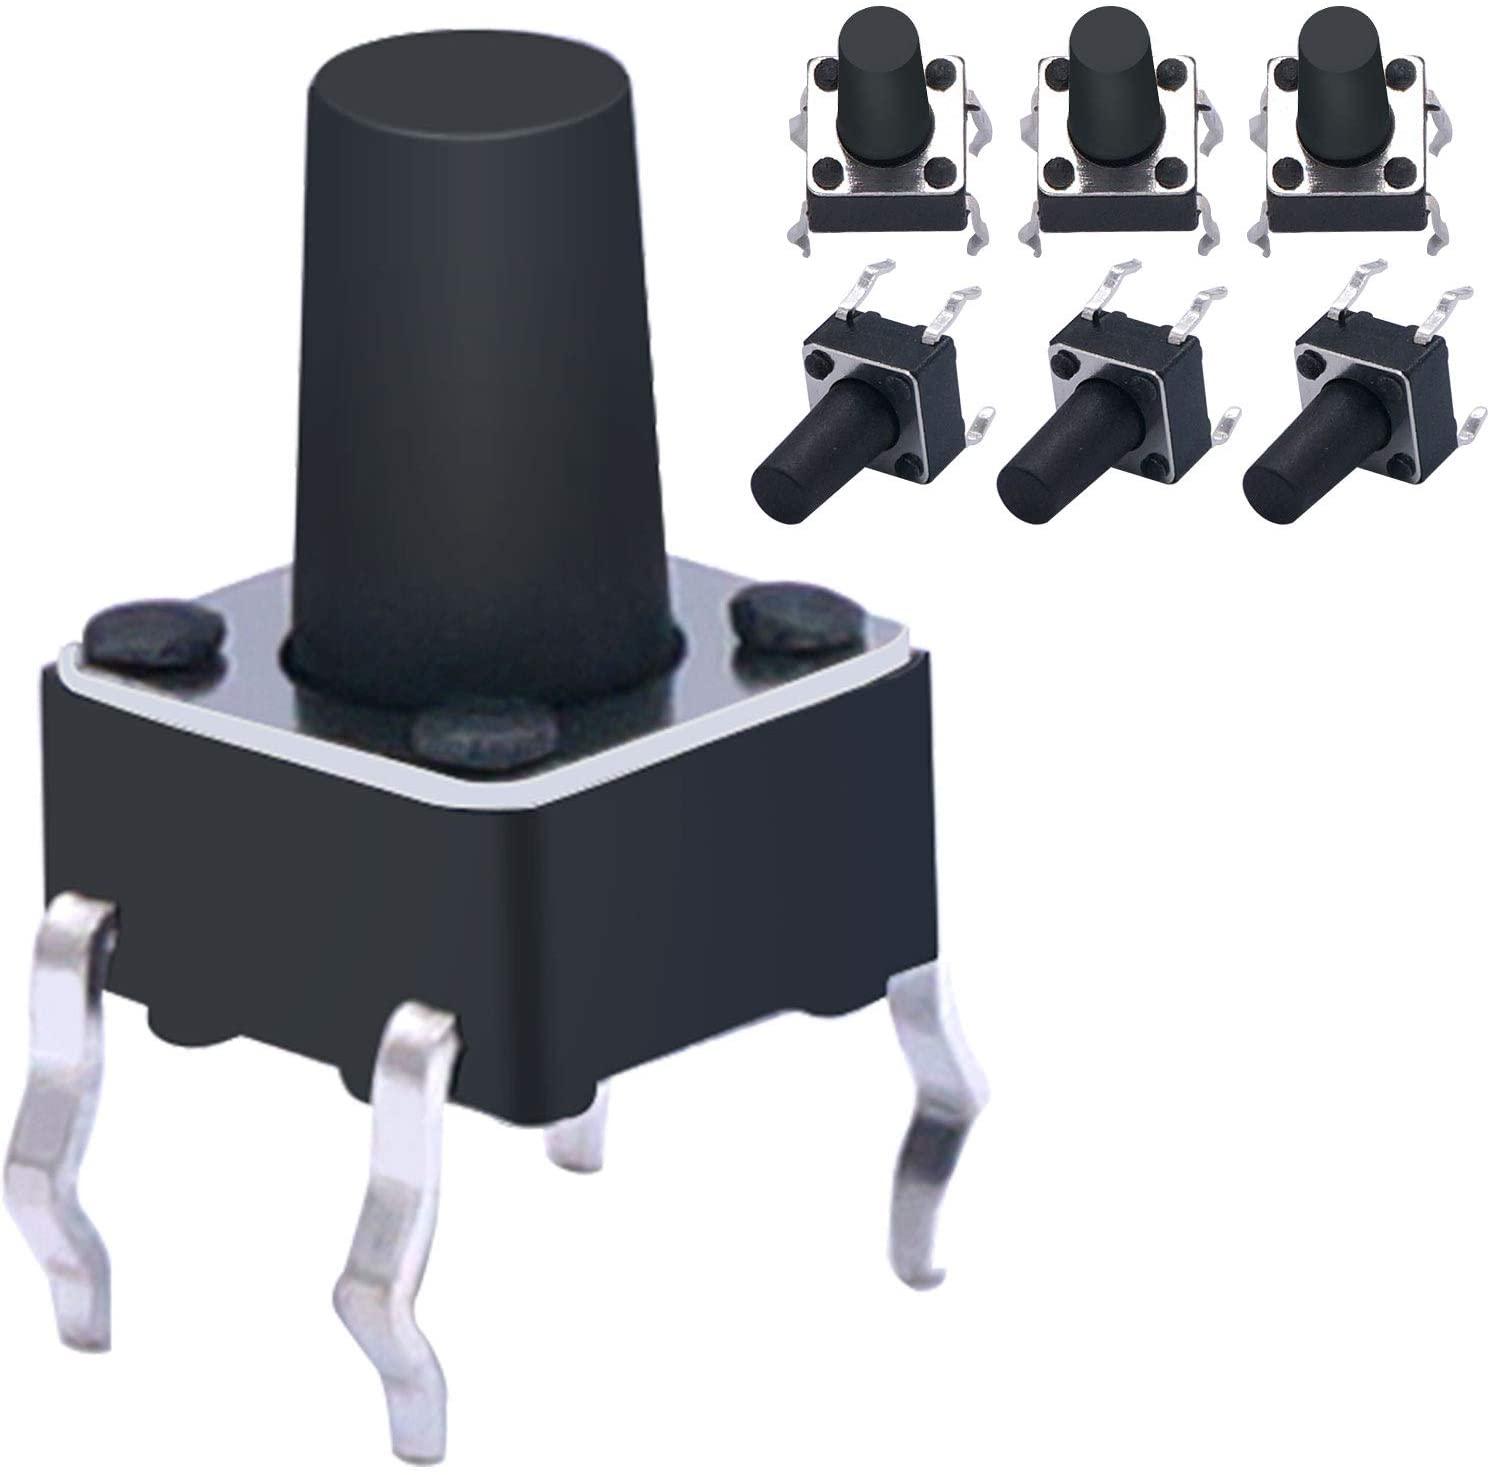 100 Pcs 6 x 6mm x 9mm PCB Momentary Tactile Tact Push Button Switch 4 Pin DIP (Black)